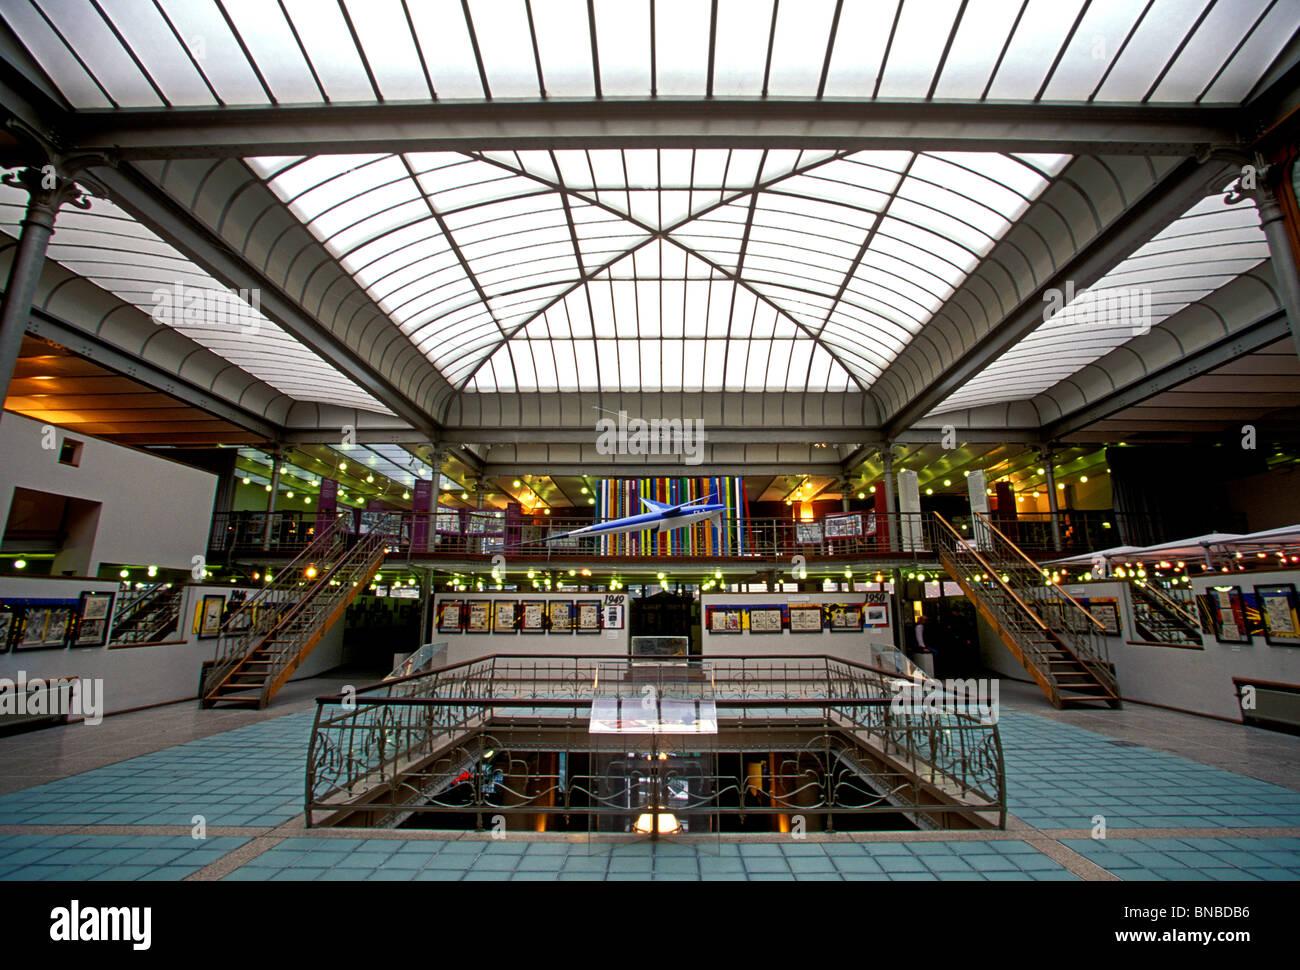 Belgische Comic Strip Center, Brüssel, Region Brüssel-Hauptstadt, Belgien Stockbild